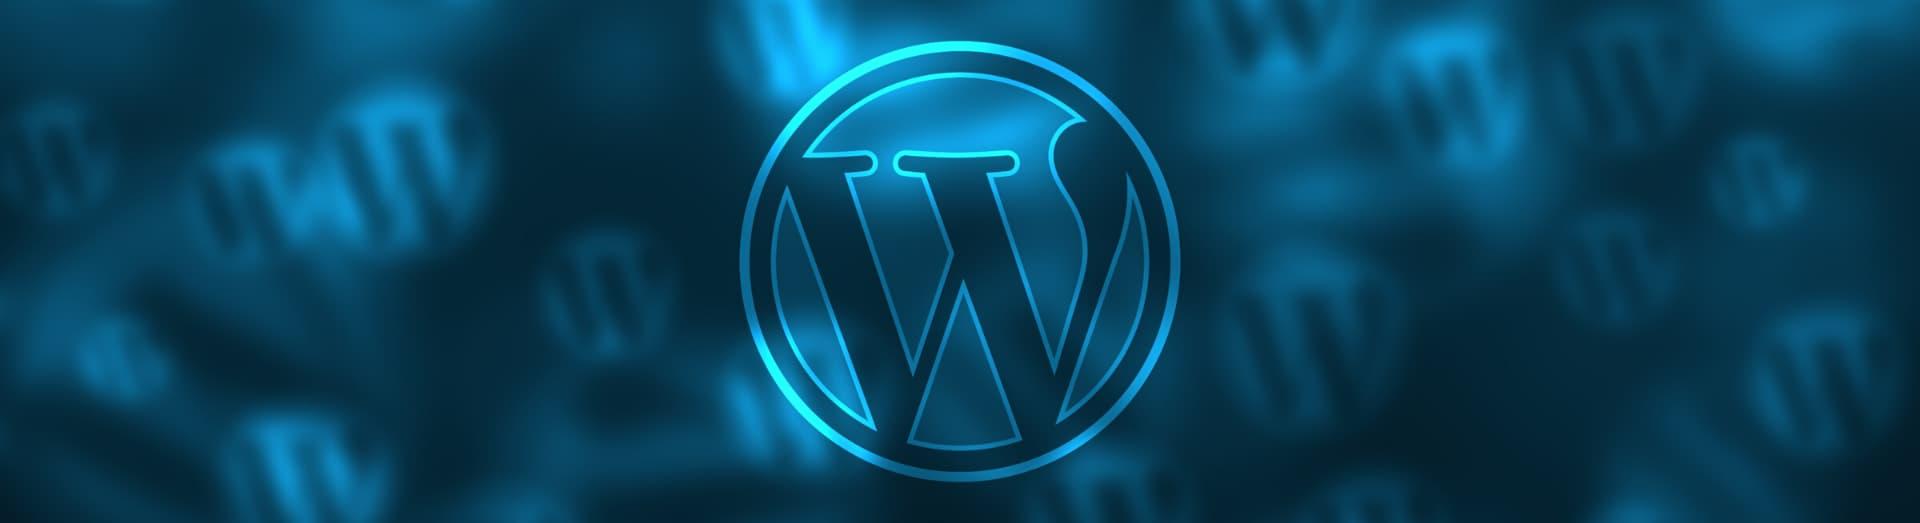 Wordpress + Woocommerce 3